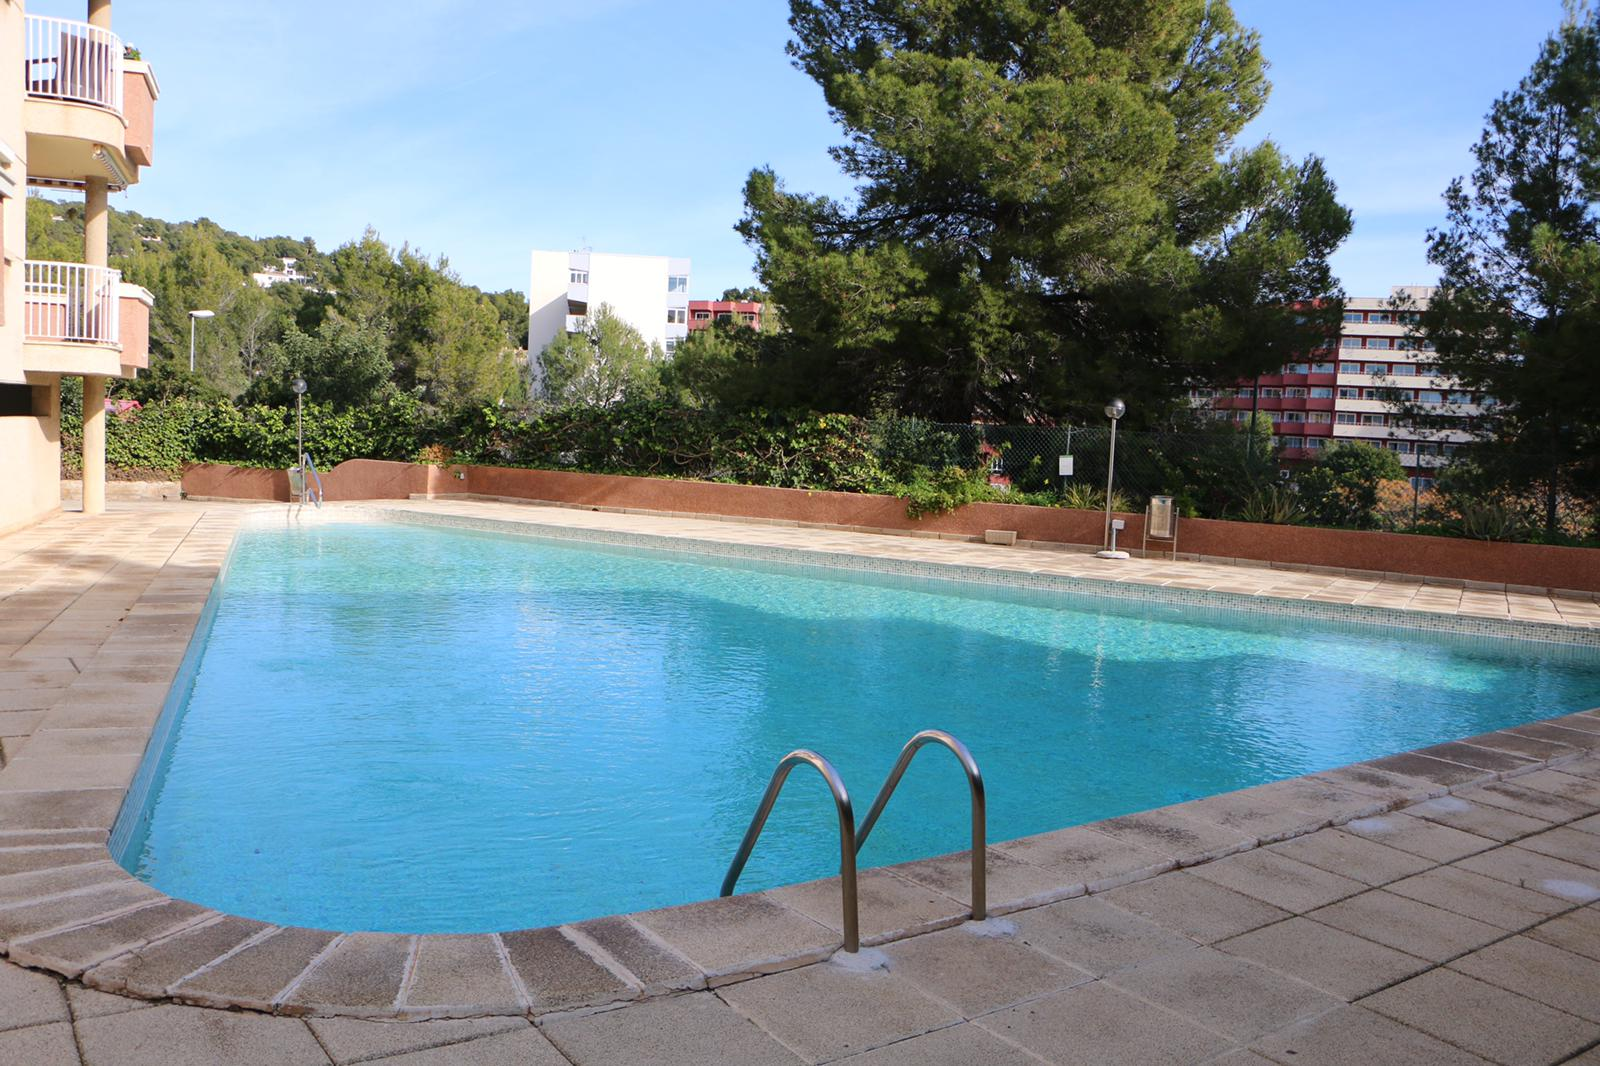 Portals Nous Mallorca: 2 bedrooms apartment with parking, pool